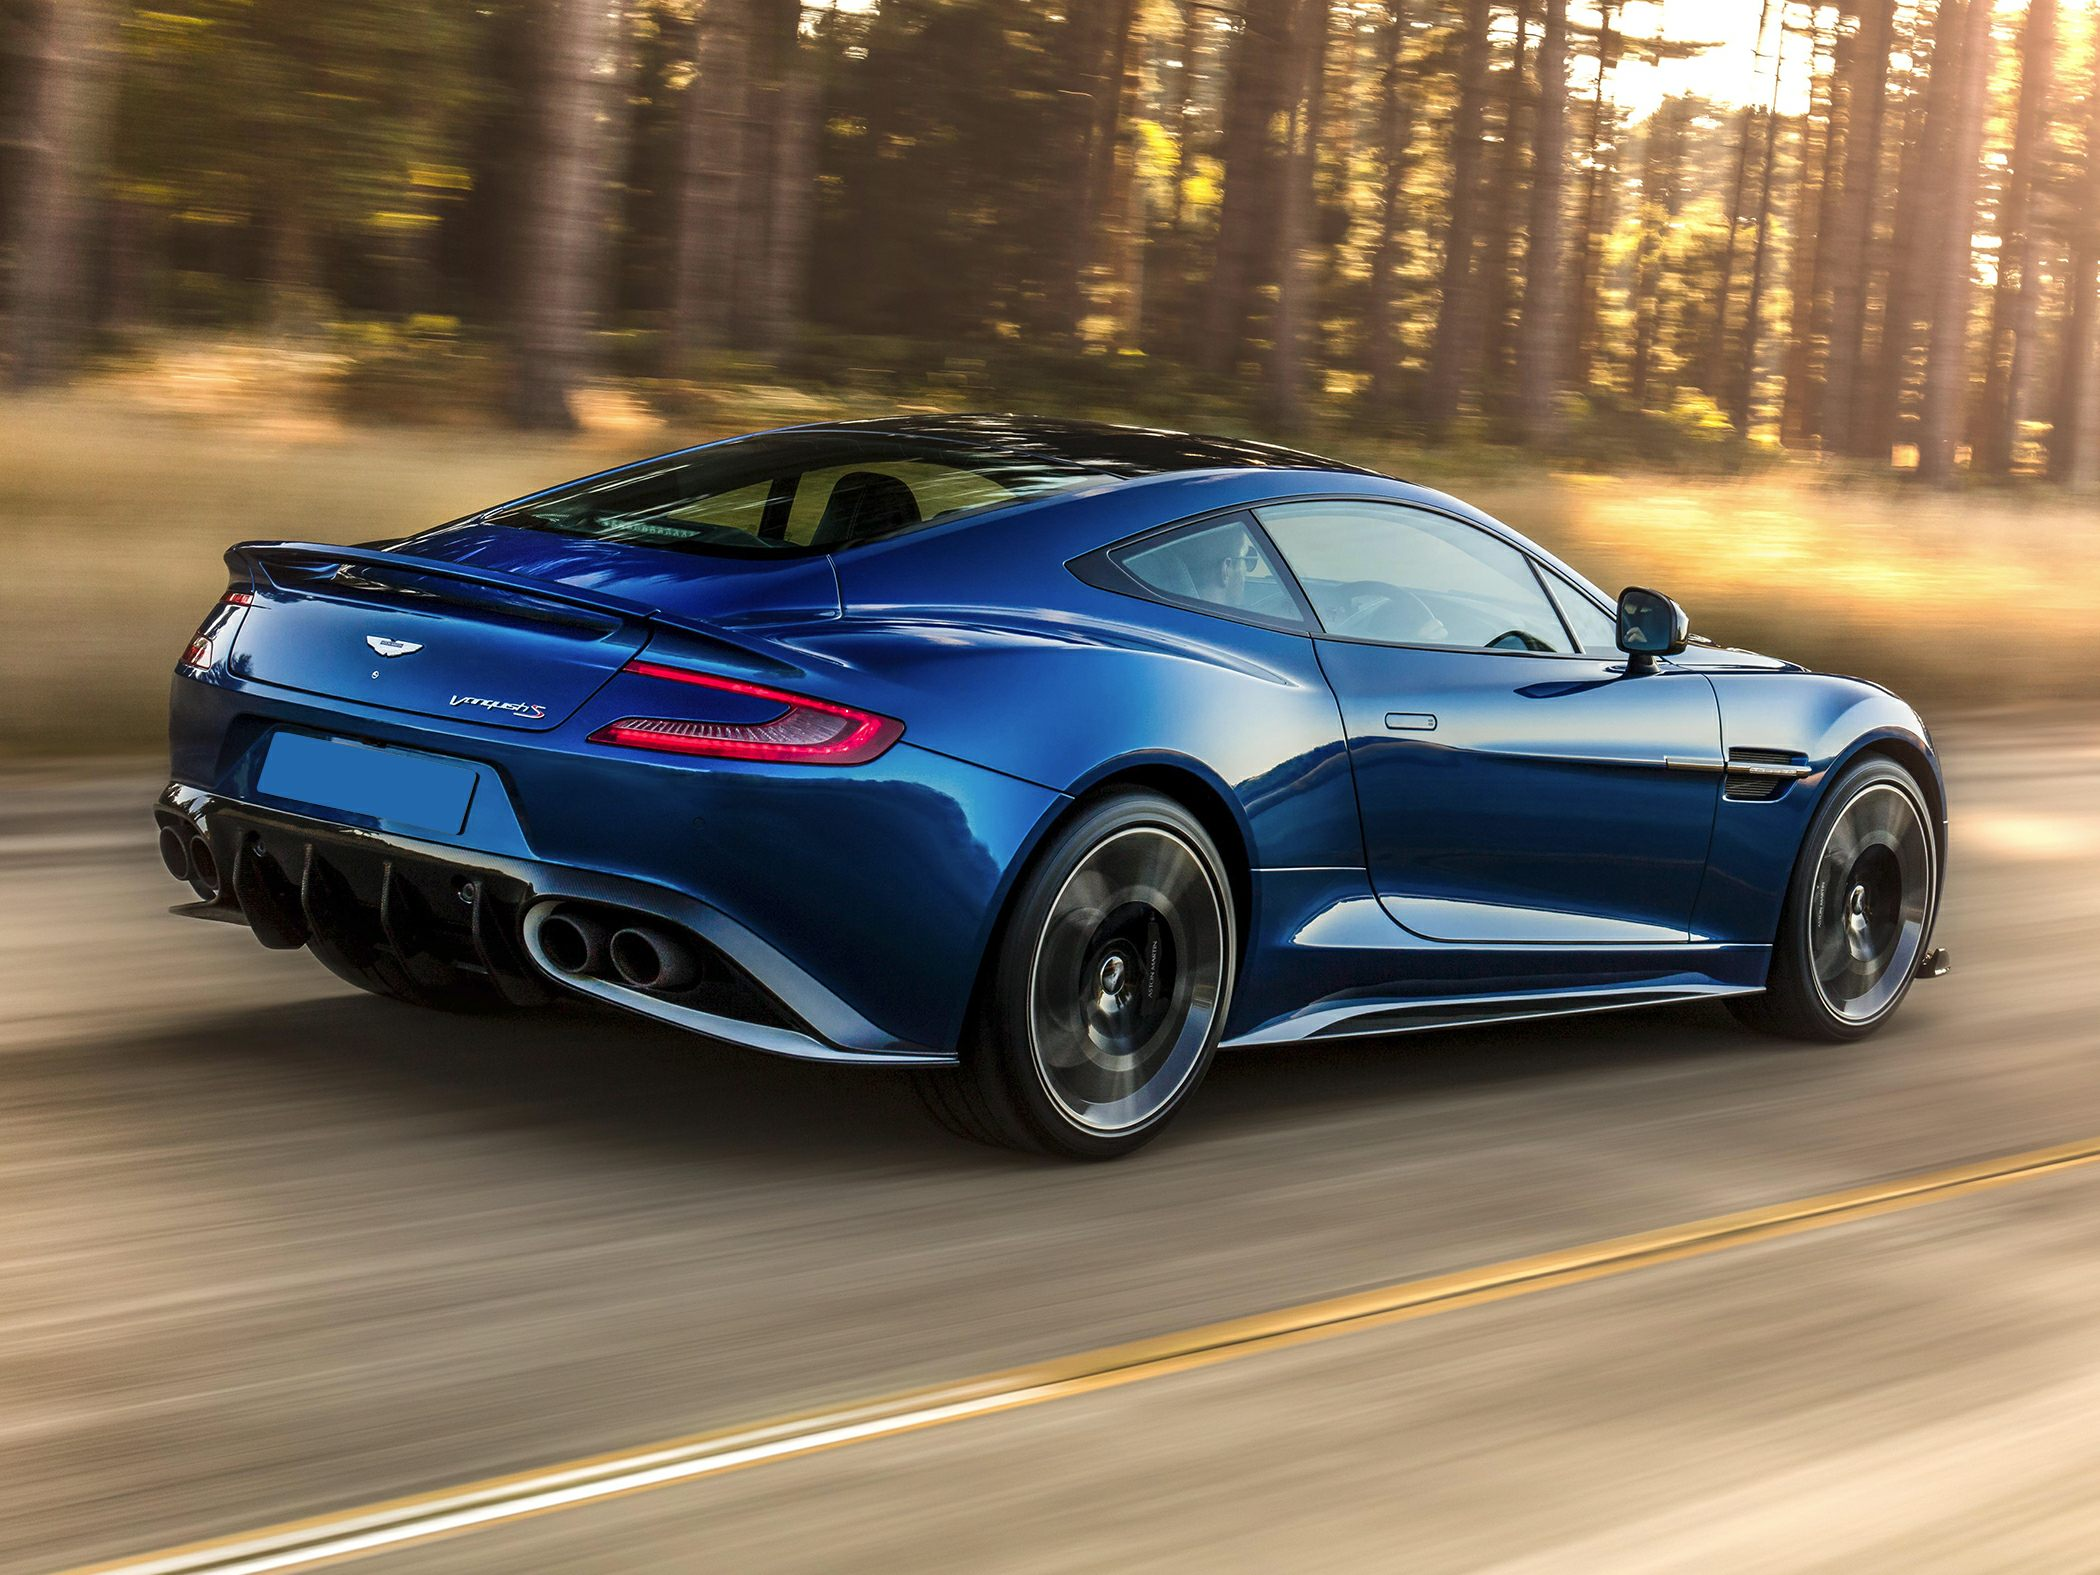 2019 Aston Martin Vanquish Specs Safety Rating Mpg Carsdirect